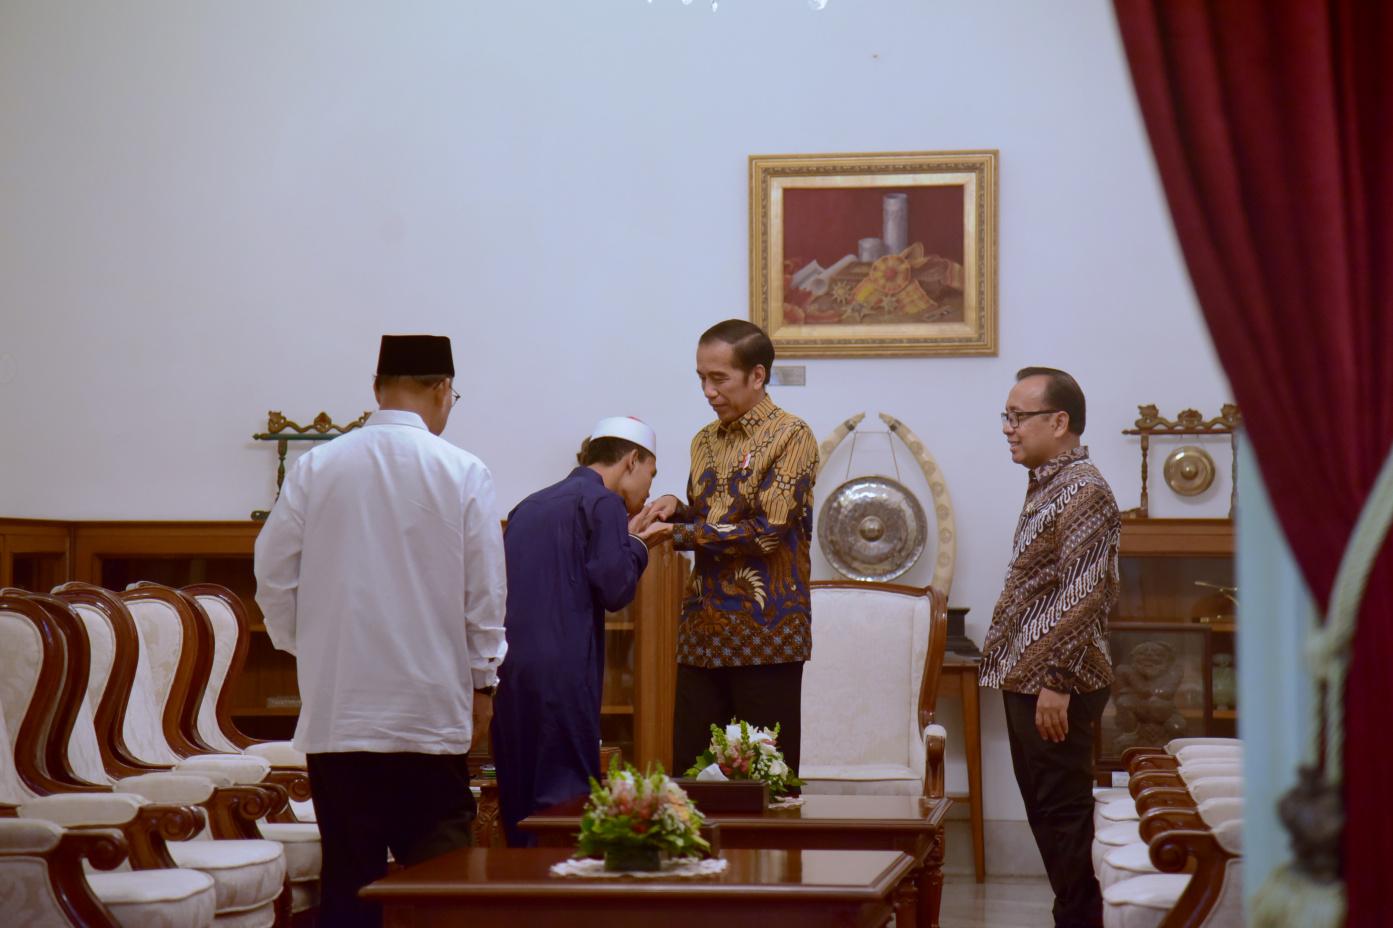 DIterima Presiden Jokowi, Juara I MTQ Internasional Mengaku Terharu, Sedih Campur Bahagia